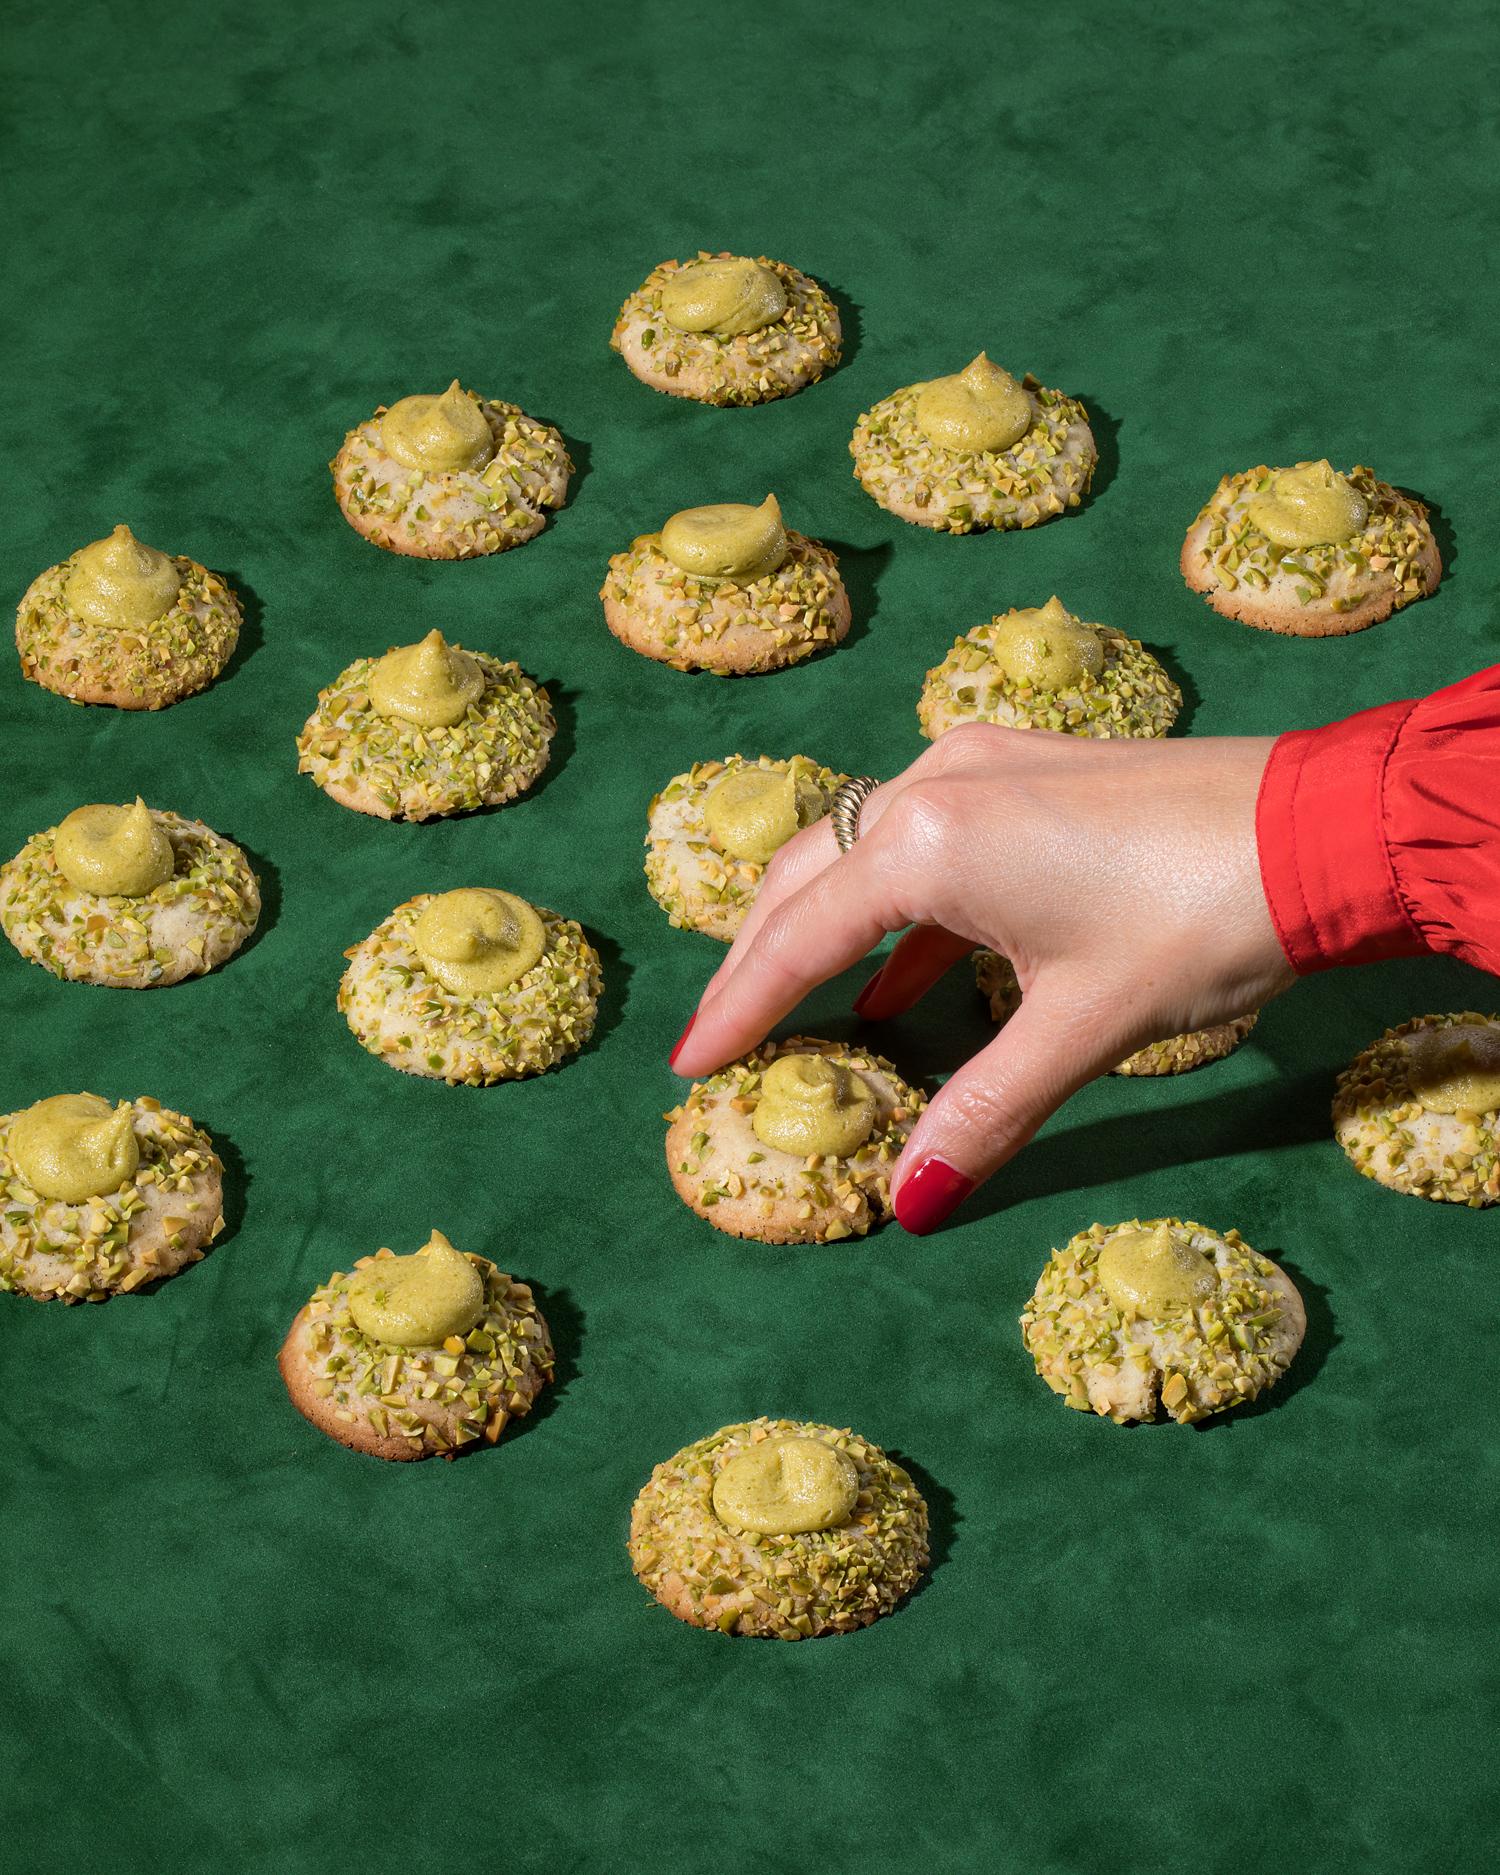 BonApp_Cookies_Shot_131665.jpg